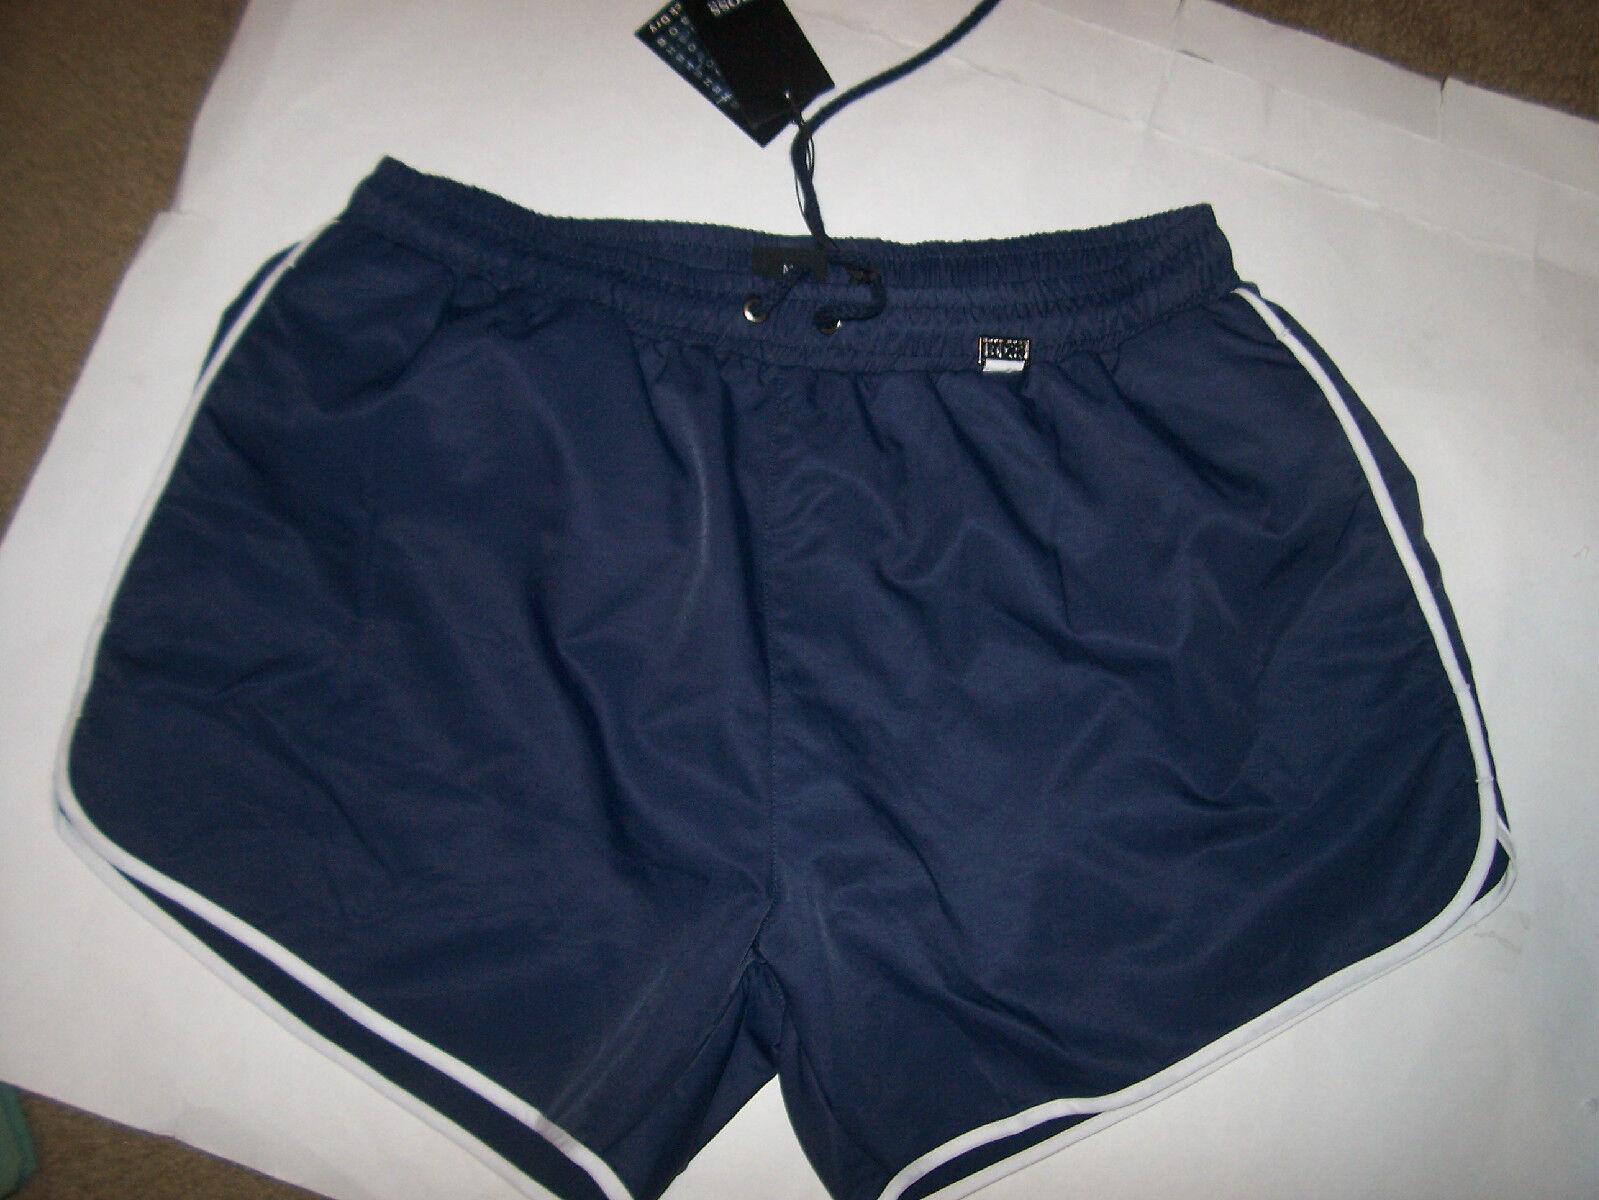 NEW HUGO BOSS navy bluee swim trunks board shorts swimwear Springfish Large or XL